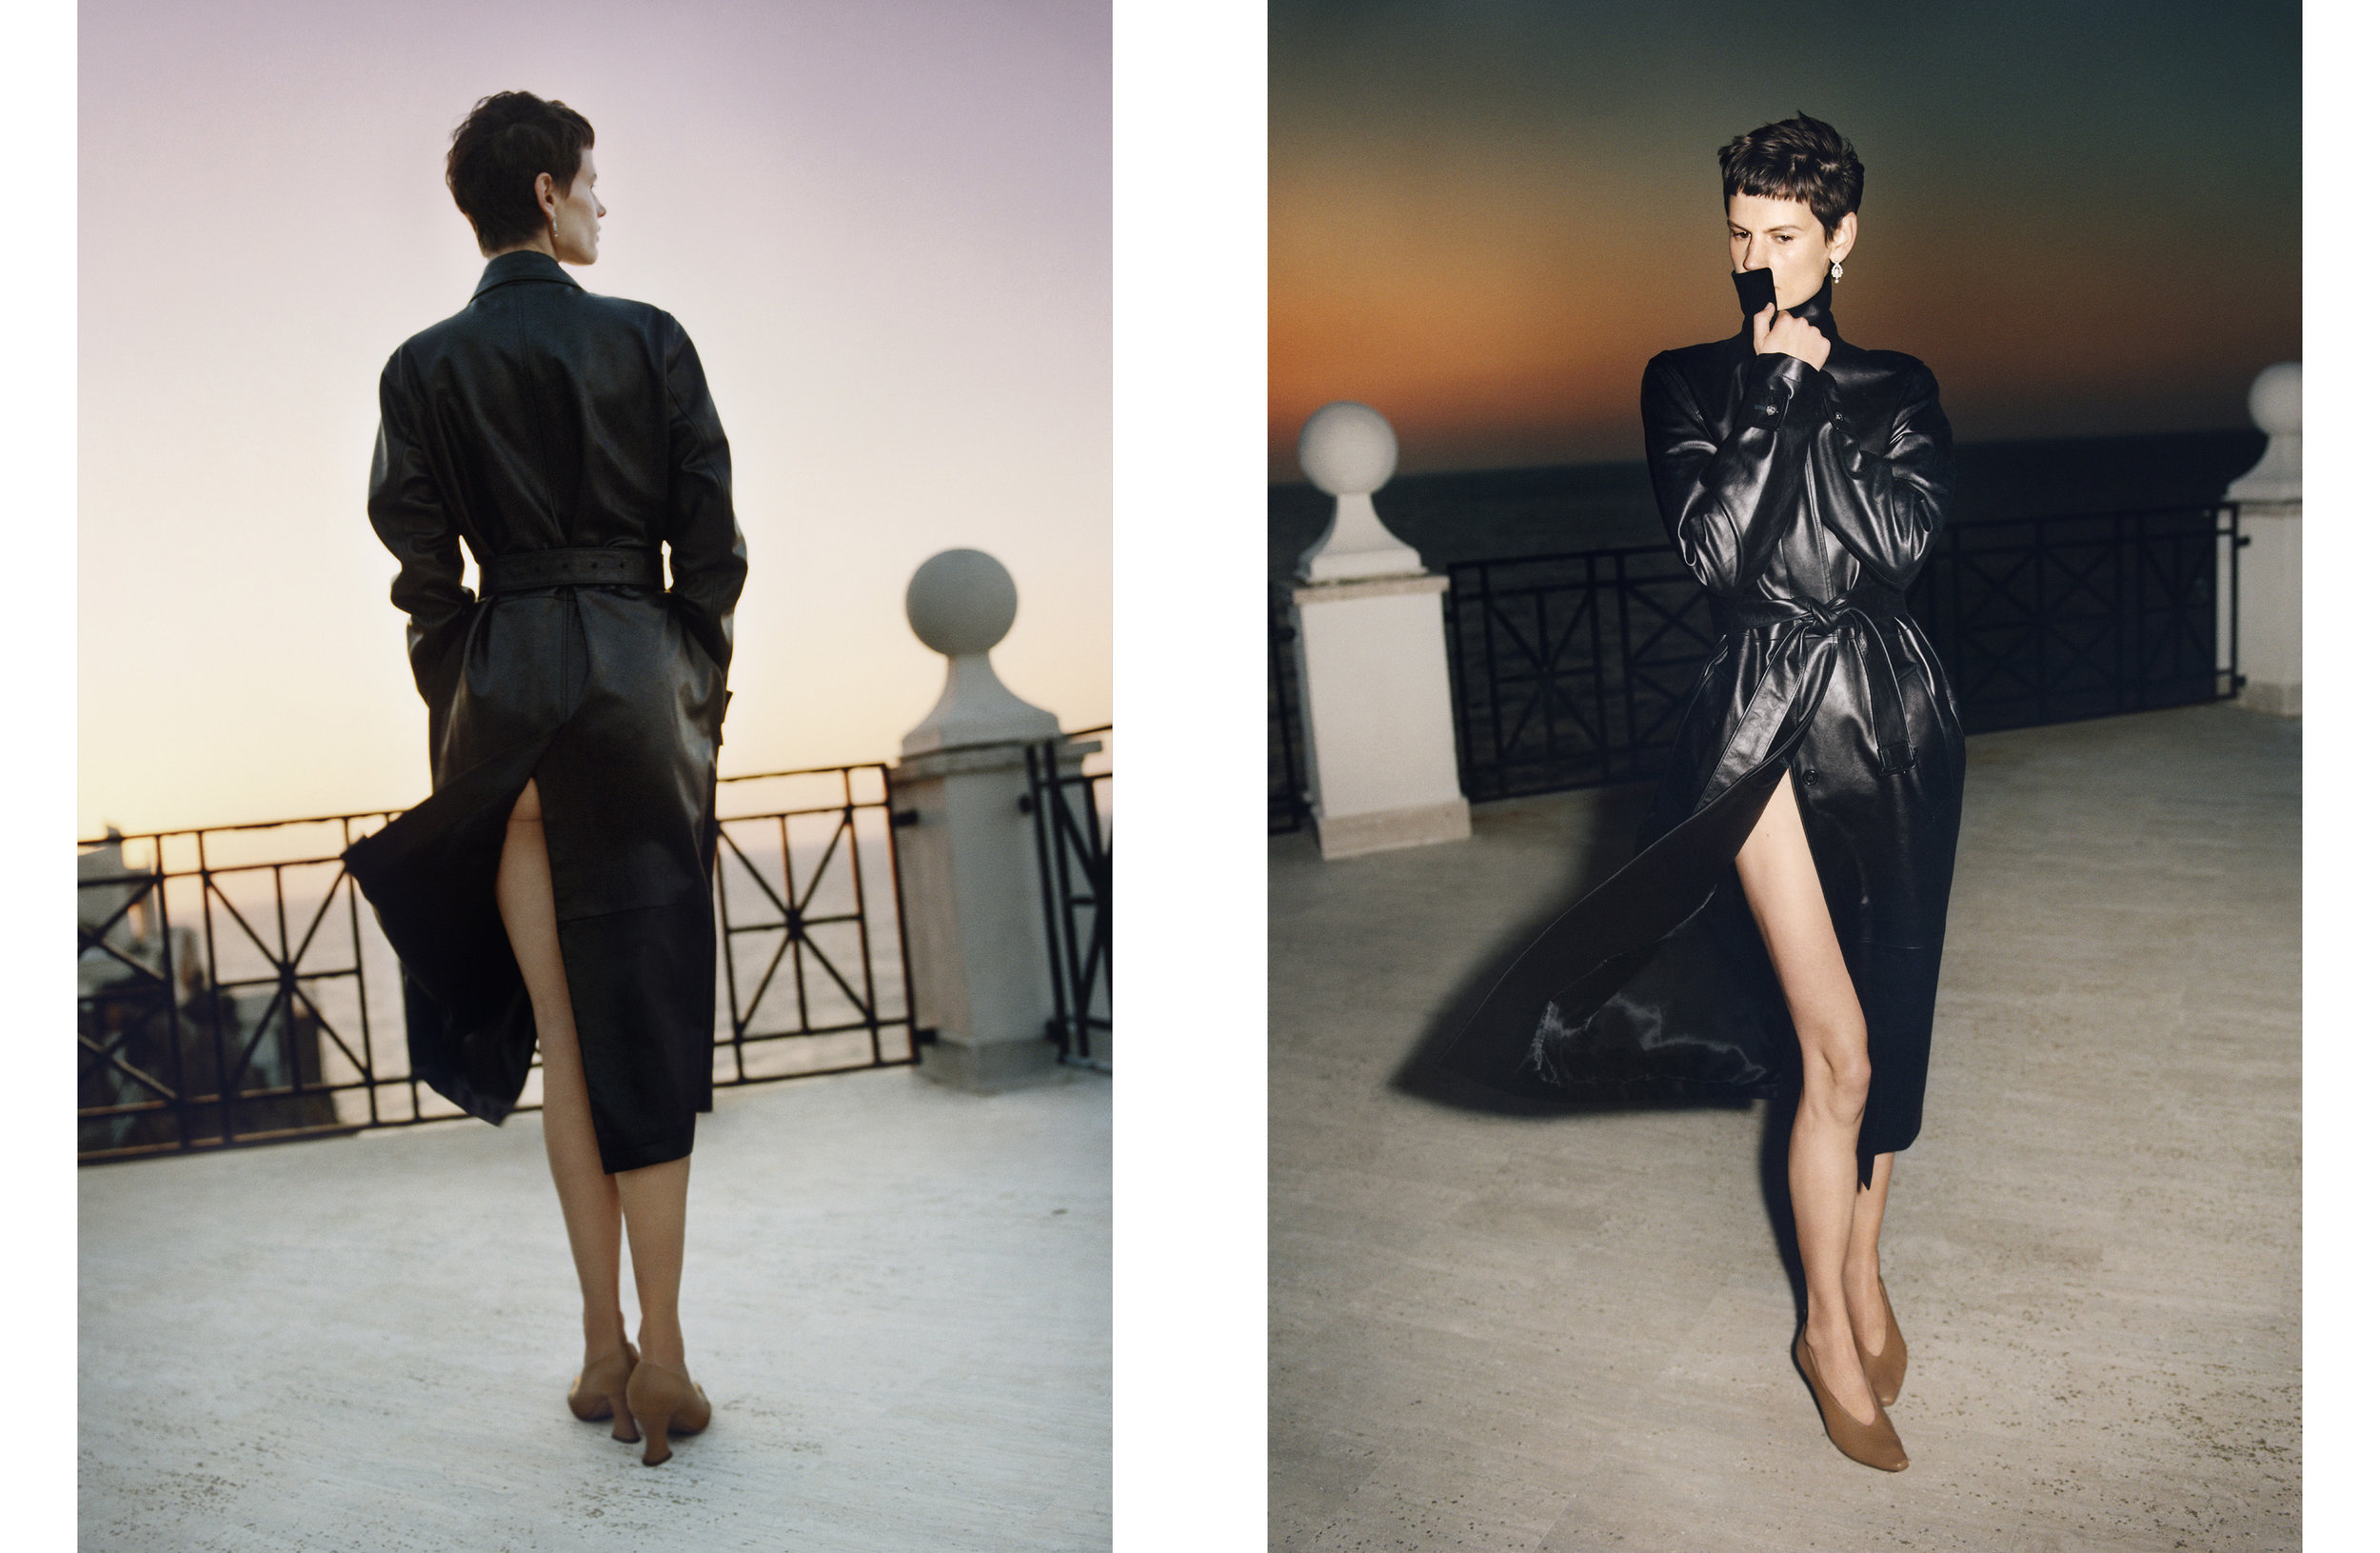 Bottega+Veneta+SS19+campaign+DPS+05.jpg